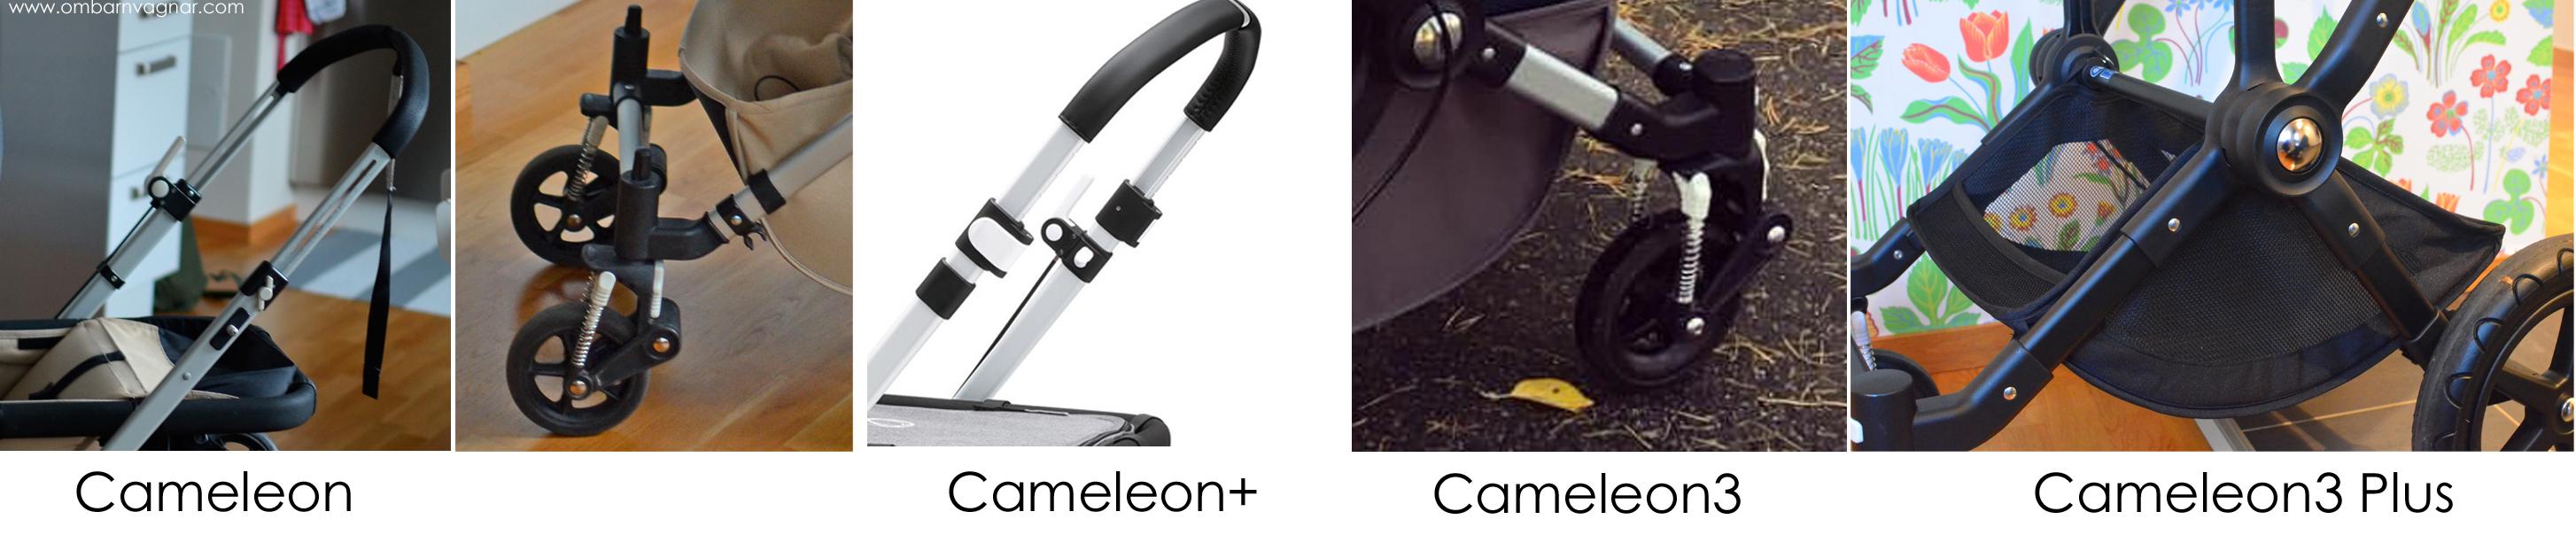 Så ser man vilken Bugaboo Cameleon man har